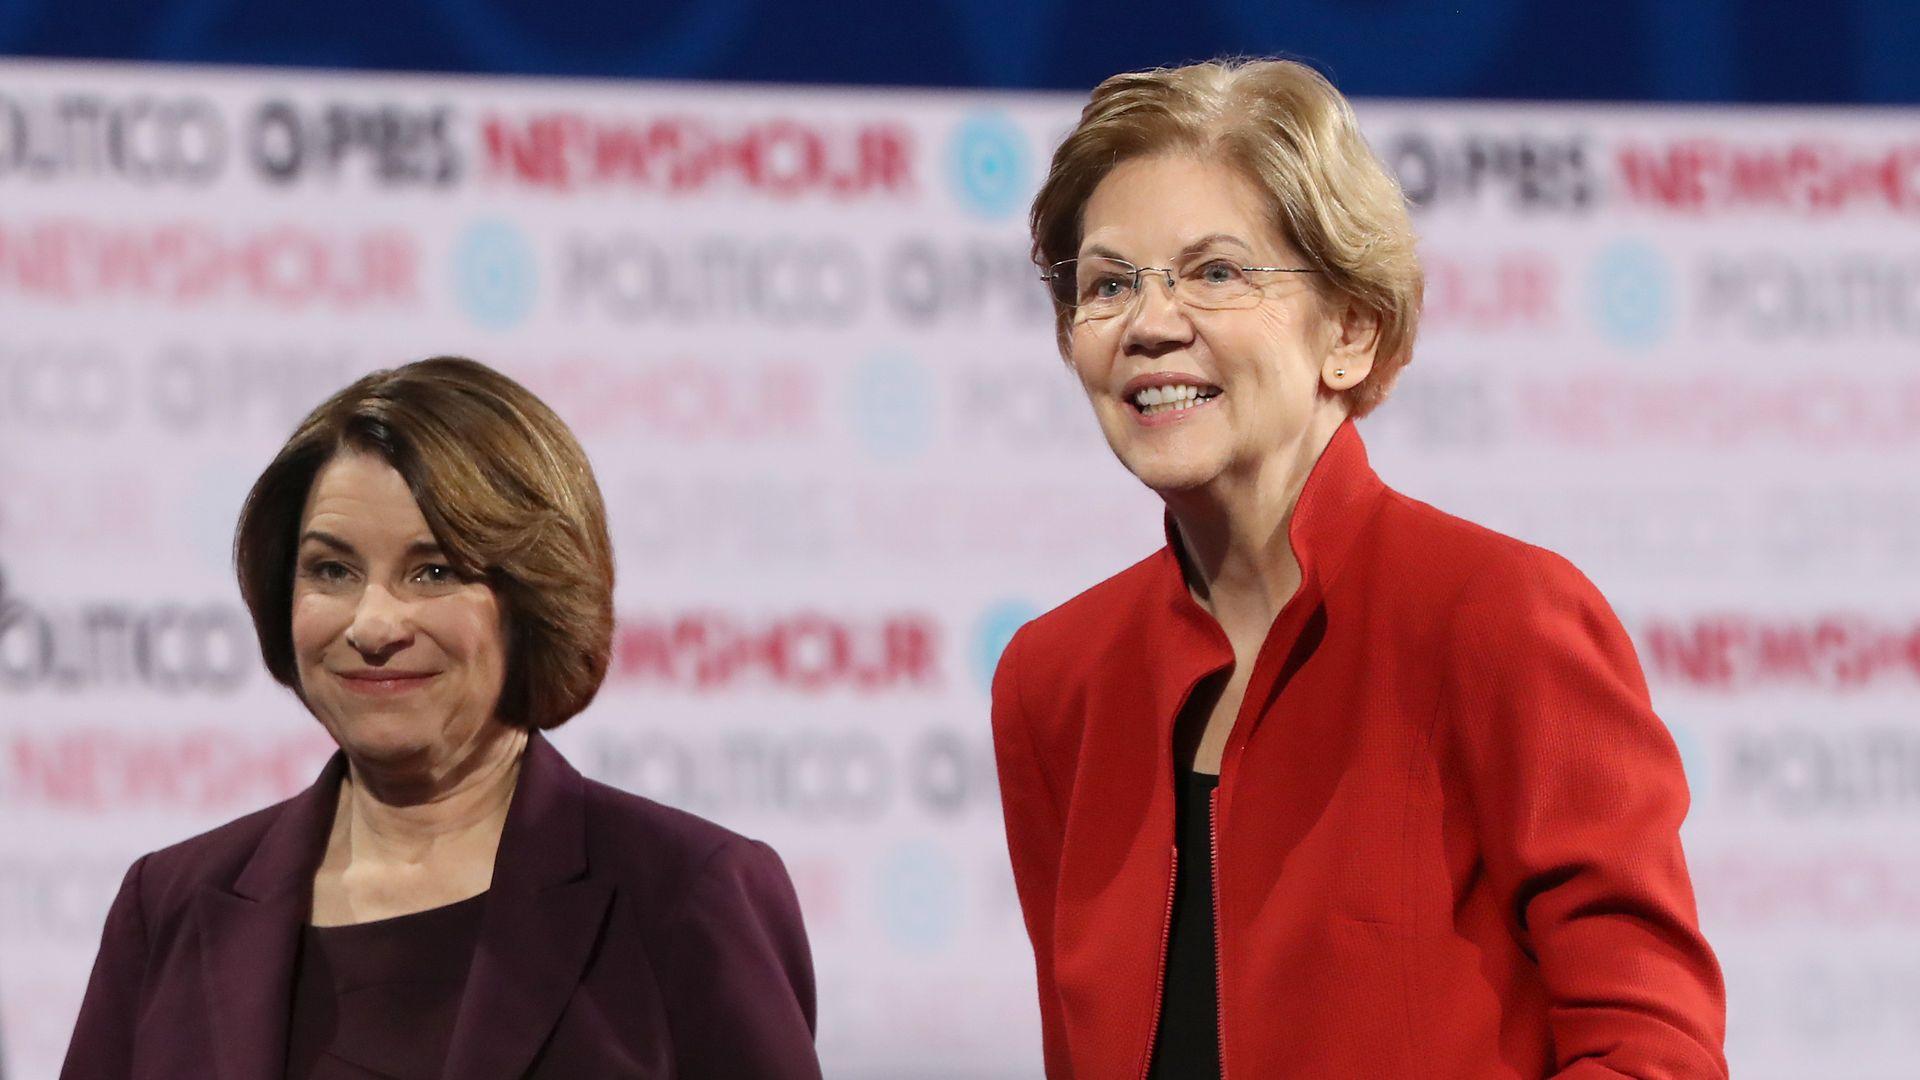 Democratic presidential candidate Sen. Elizabeth Warren (D-MA) (R) and Sen. Amy Klobuchar at a debate